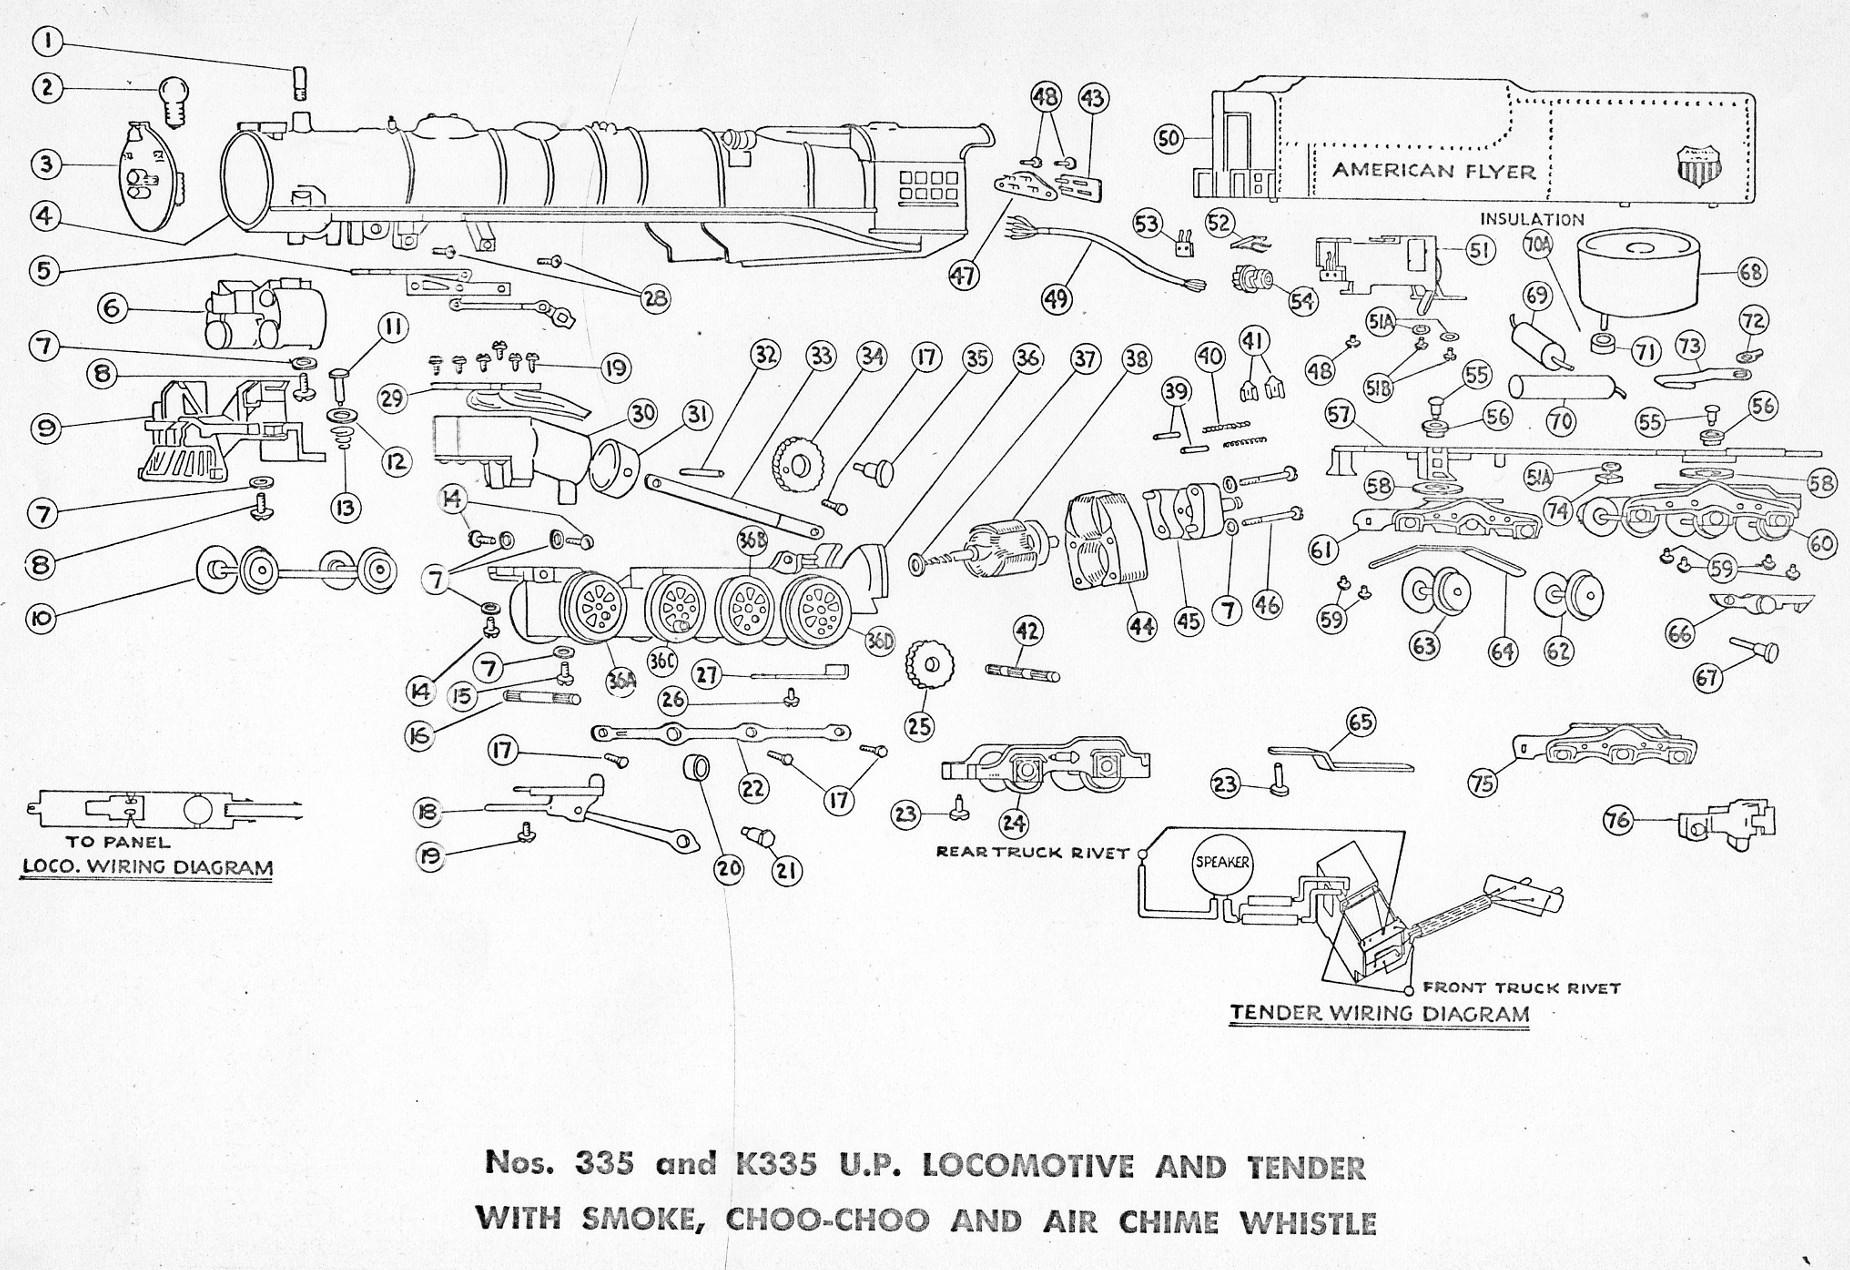 American Flyer Locomotive 335 Amp K335 Parts List And Diagram